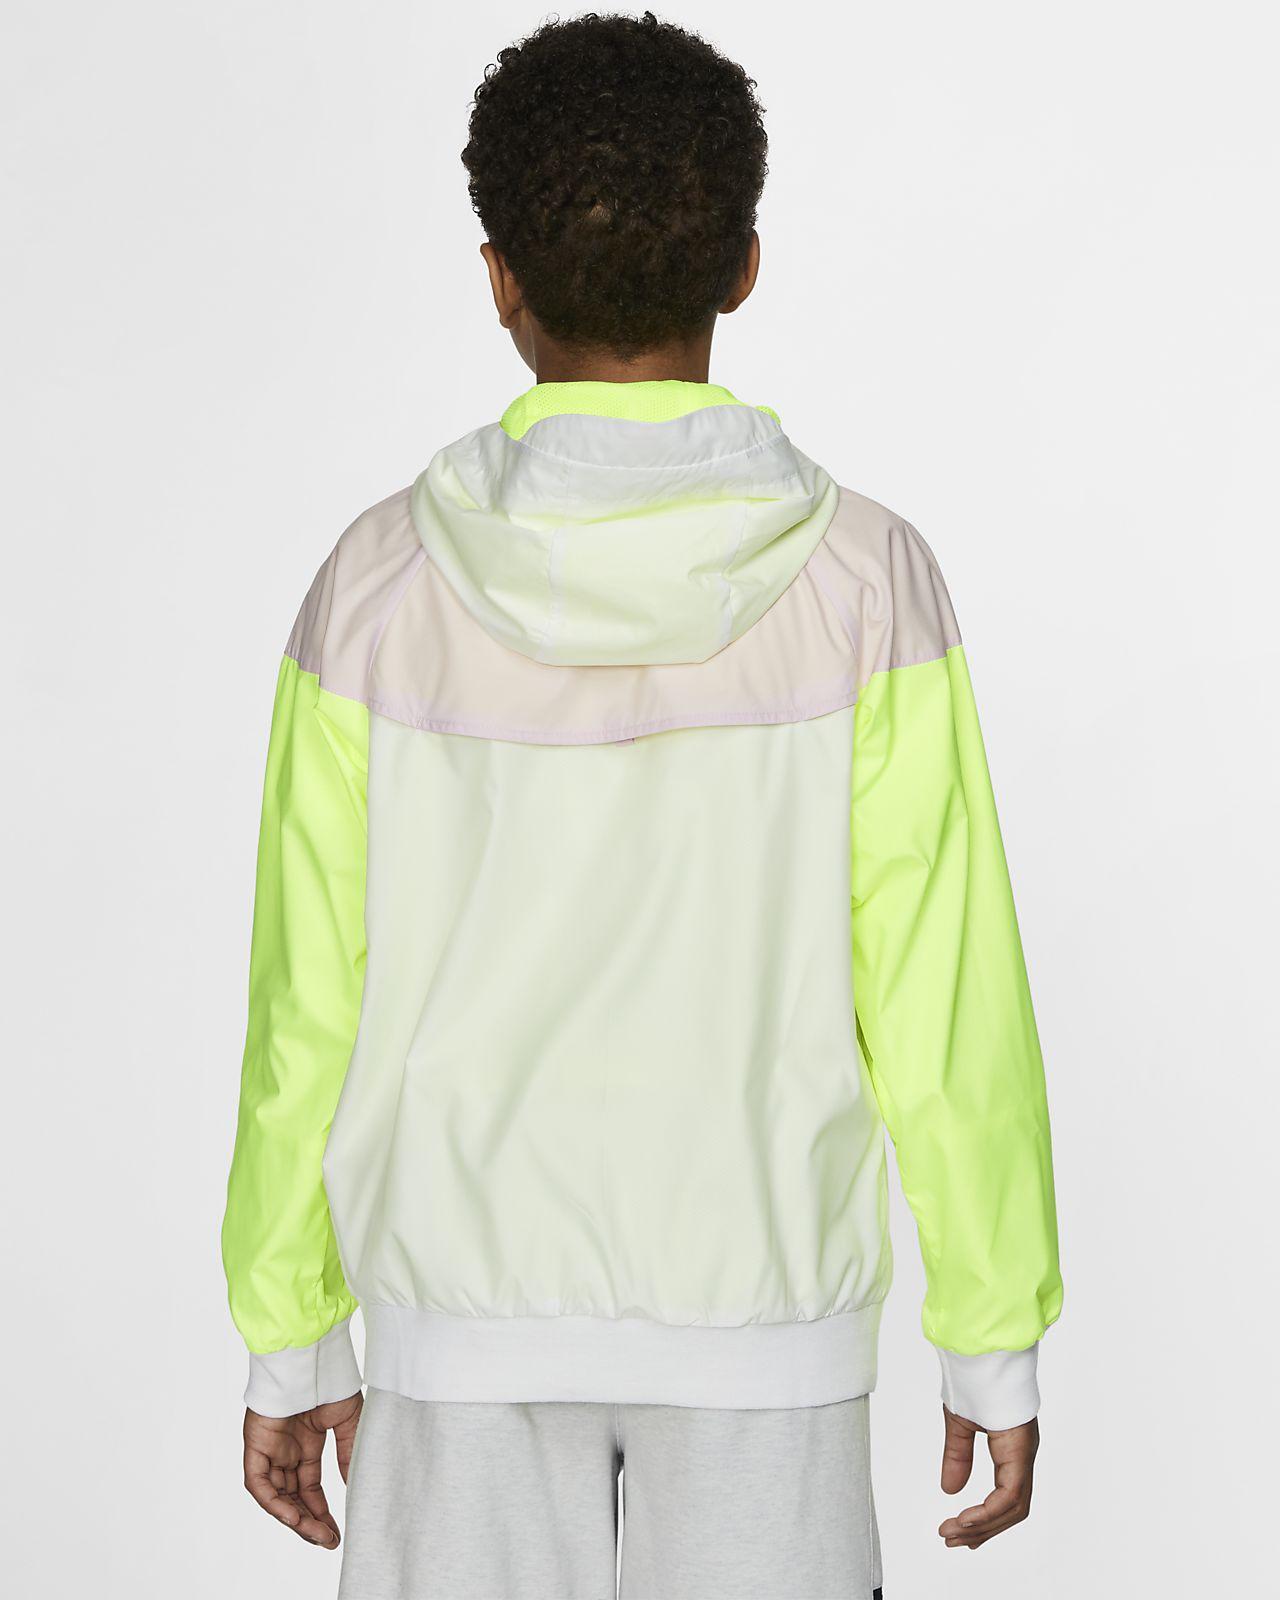 fd7b8b234 Nike Sportswear Windrunner Big Kids' (Boys') Jacket. Nike.com